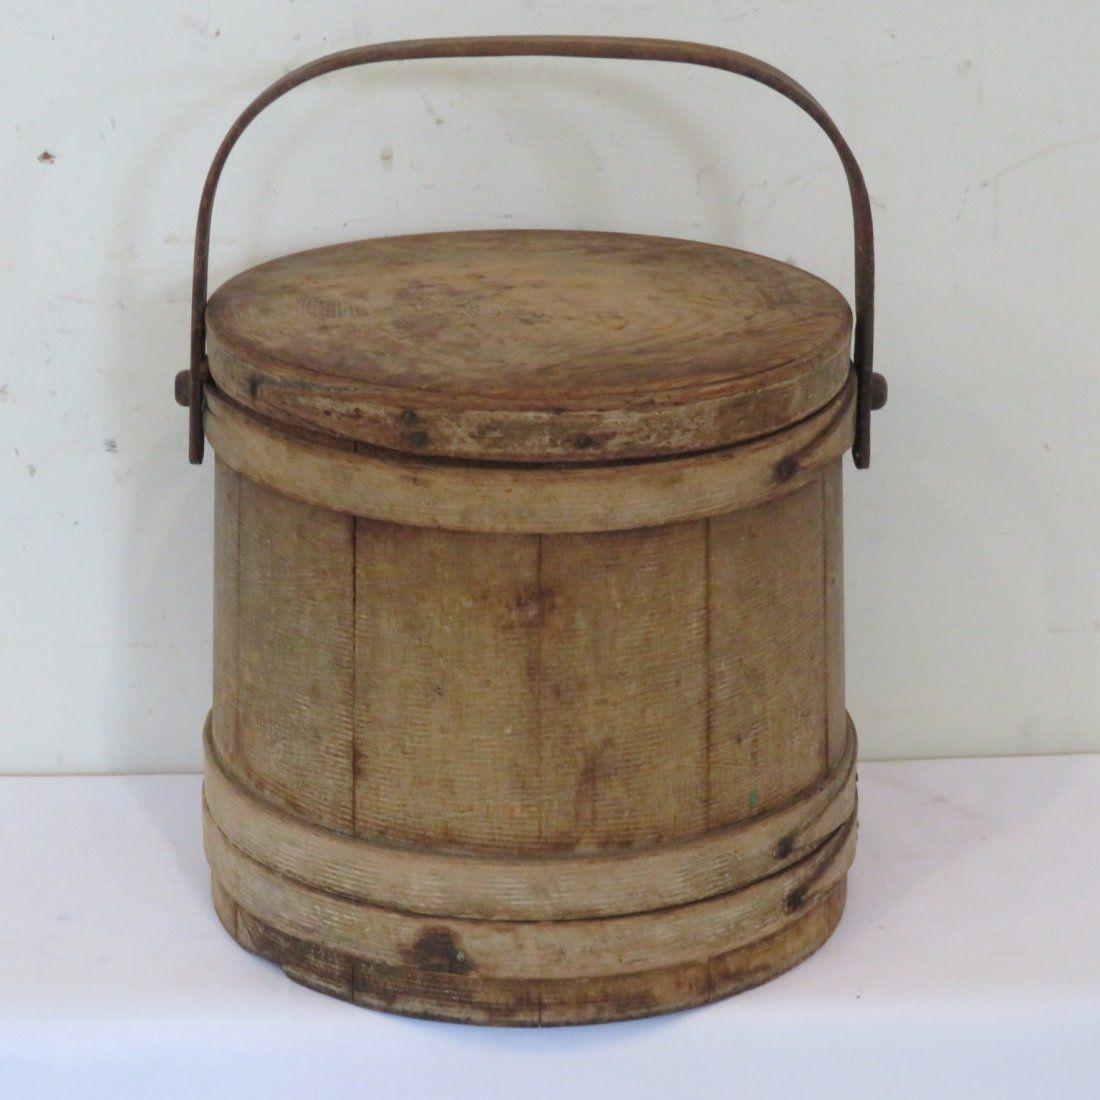 Wood firkin in old mustard grain paint with lid